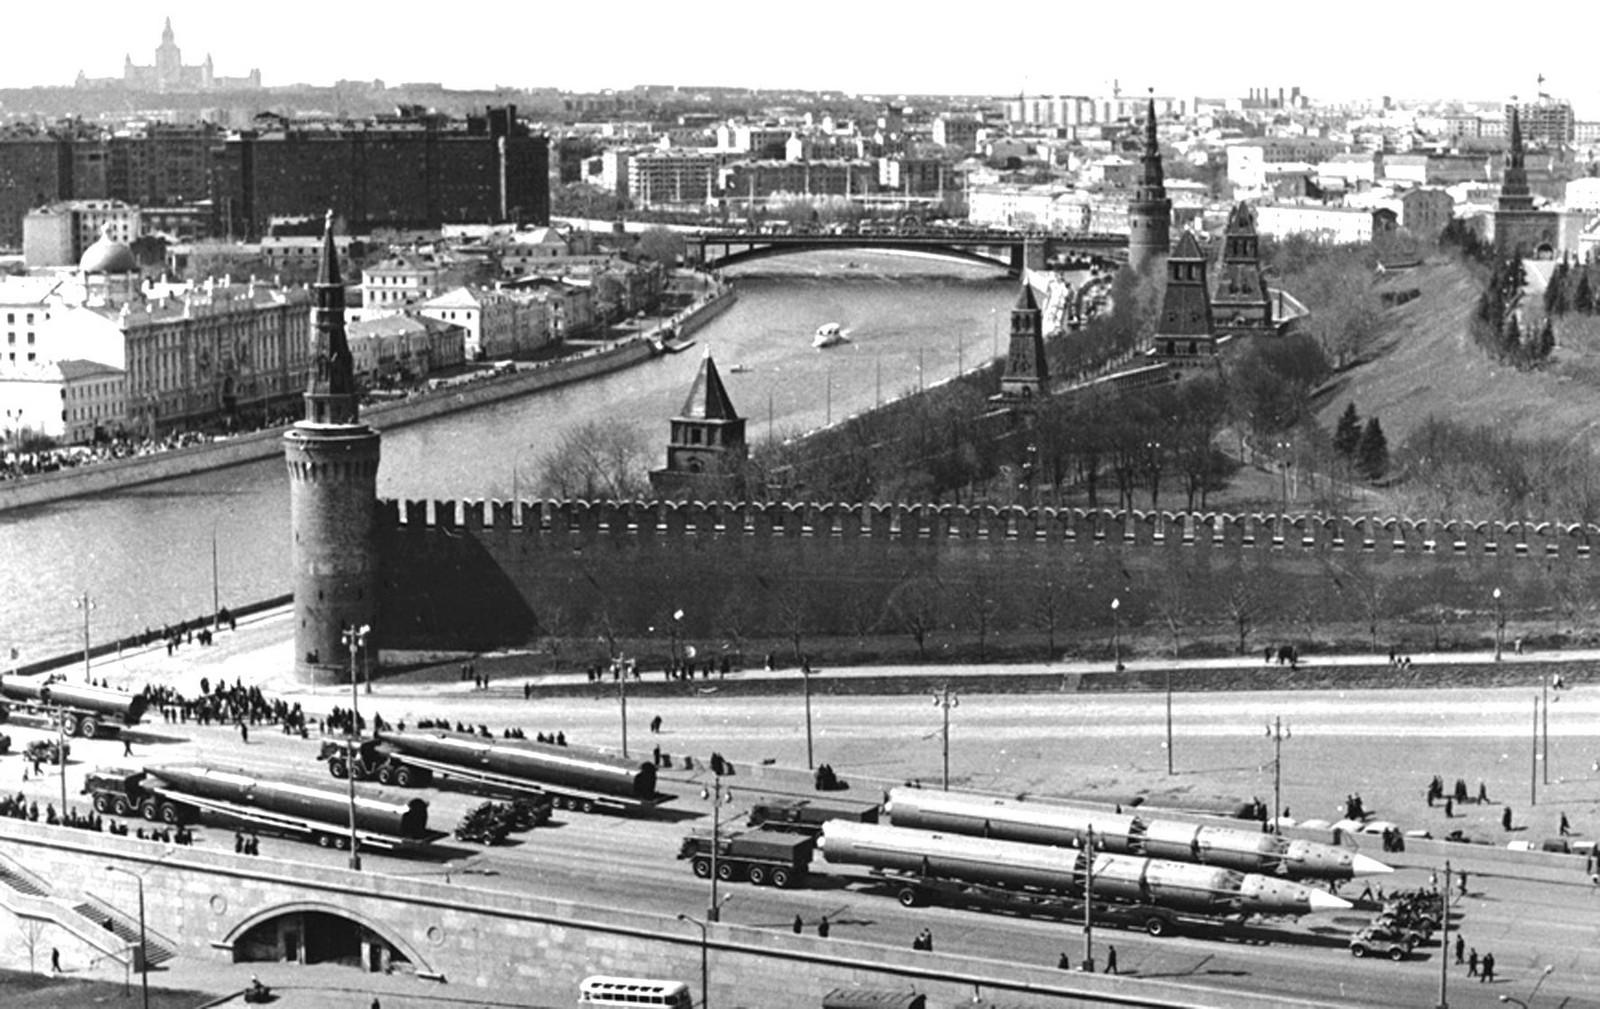 Ракетные автопоезда на Москворецком мосту после парада — тягачи МАЗ-537А с ракетами ГР-1 (справа) и МАЗ-537 с ракетами Р-26. 1965 год